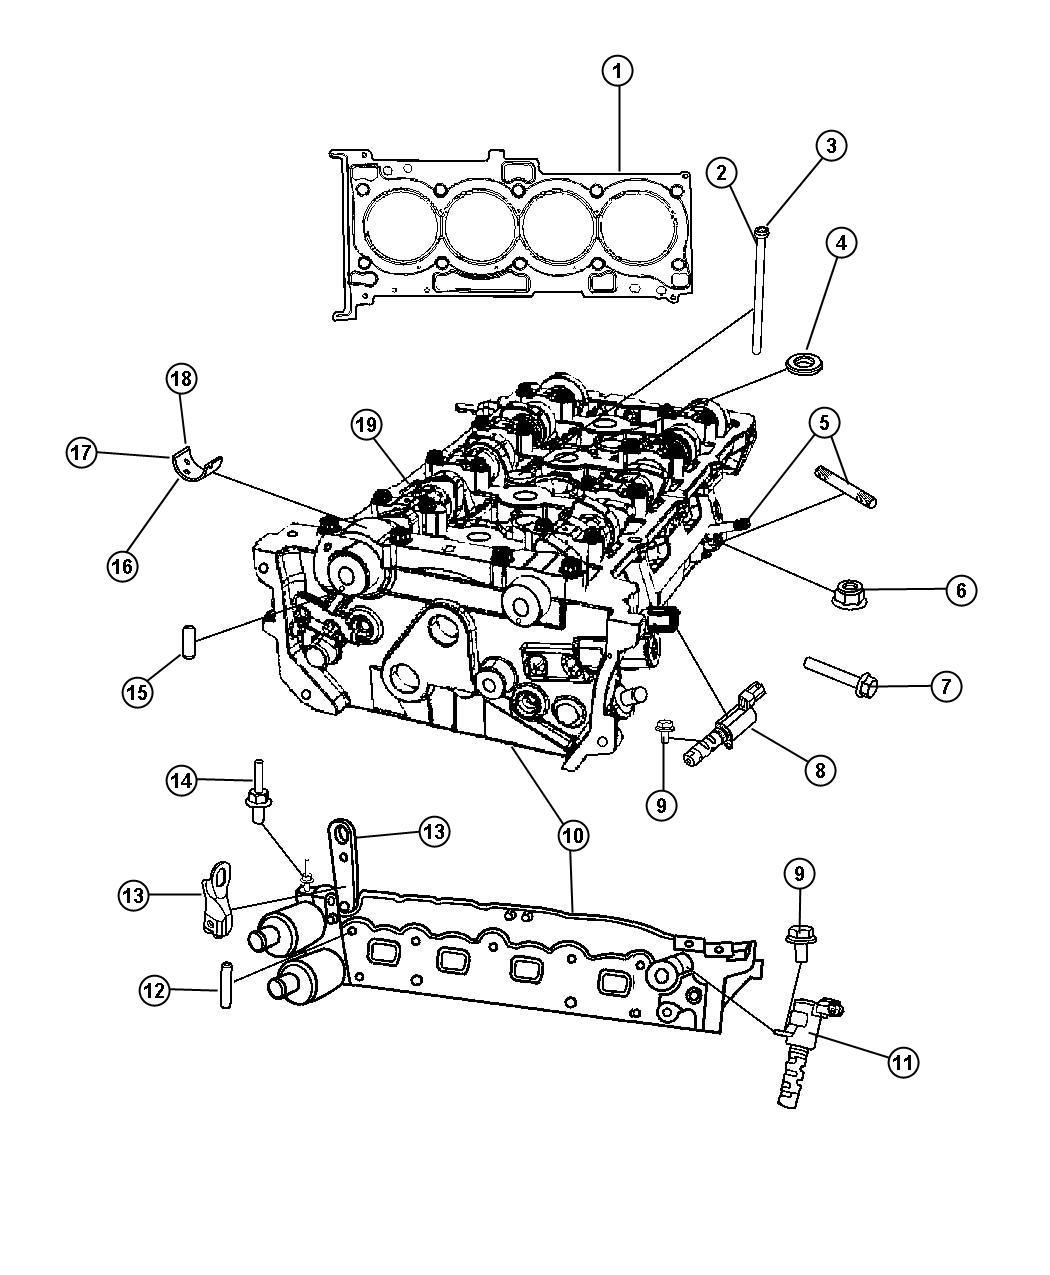 2011 Chrysler Sebring Control valve, solenoid. Oil intake